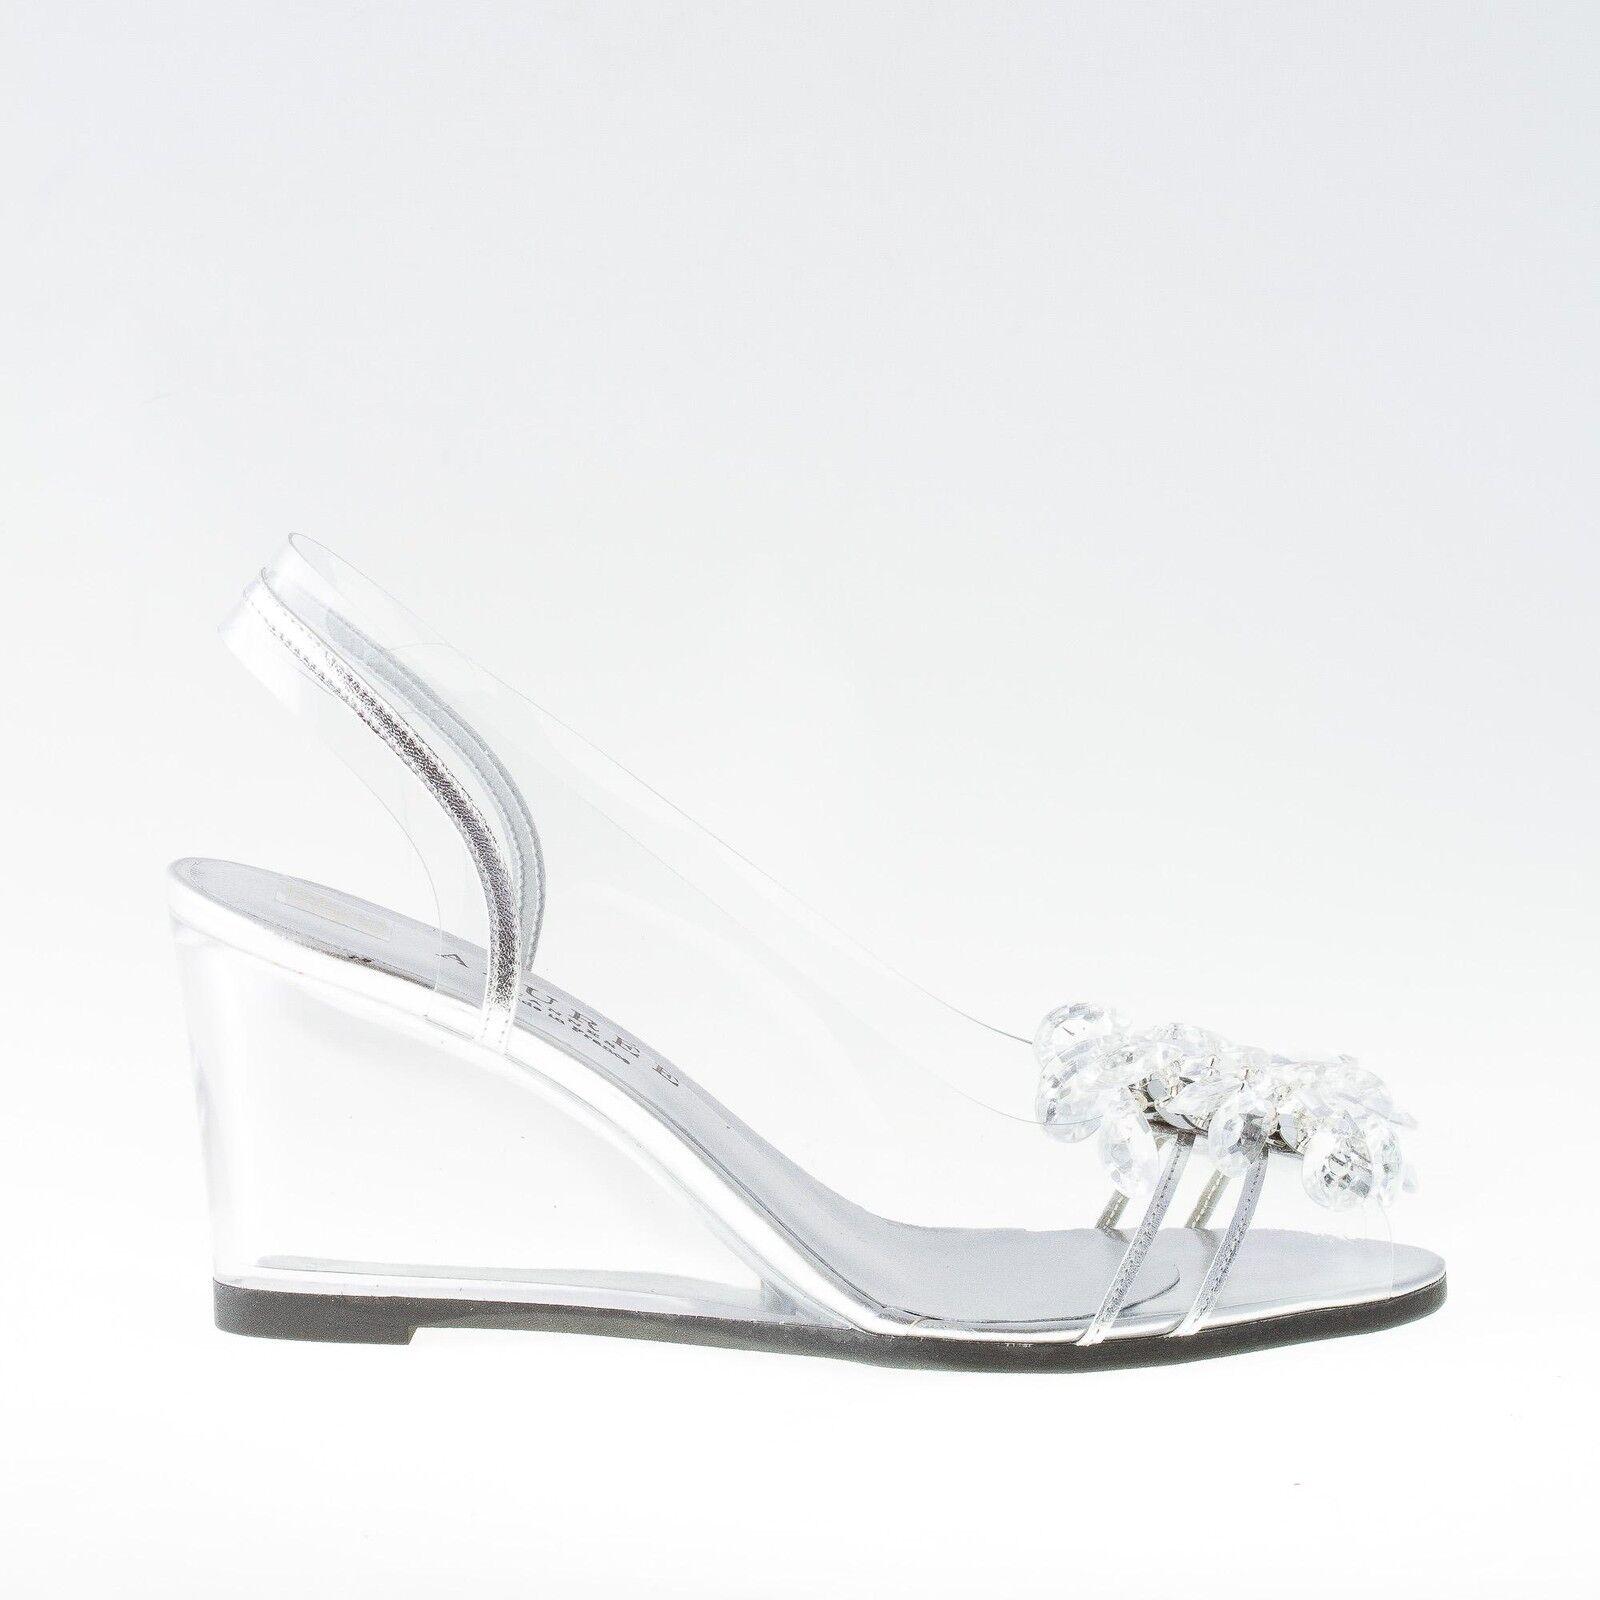 AZUREE Cannes Chaussures femmes Transparent nuago Sandal argent Leather and Stones